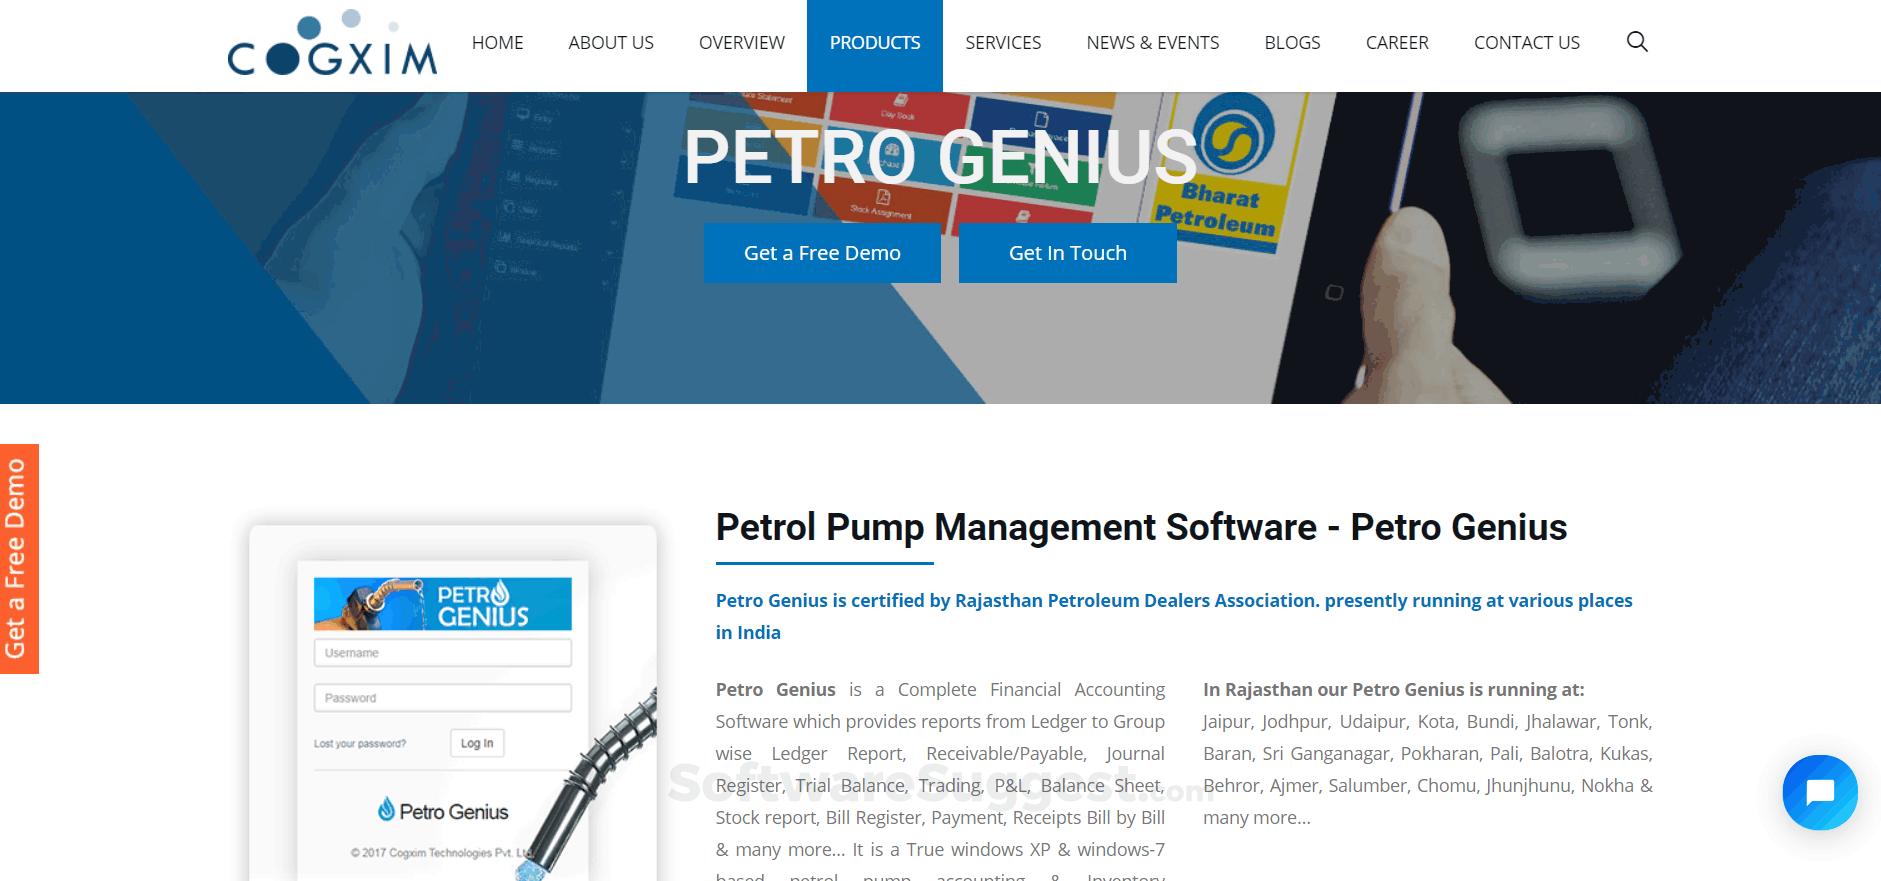 Petro Genius Pricing, Features & Reviews 2019 - Free Demo